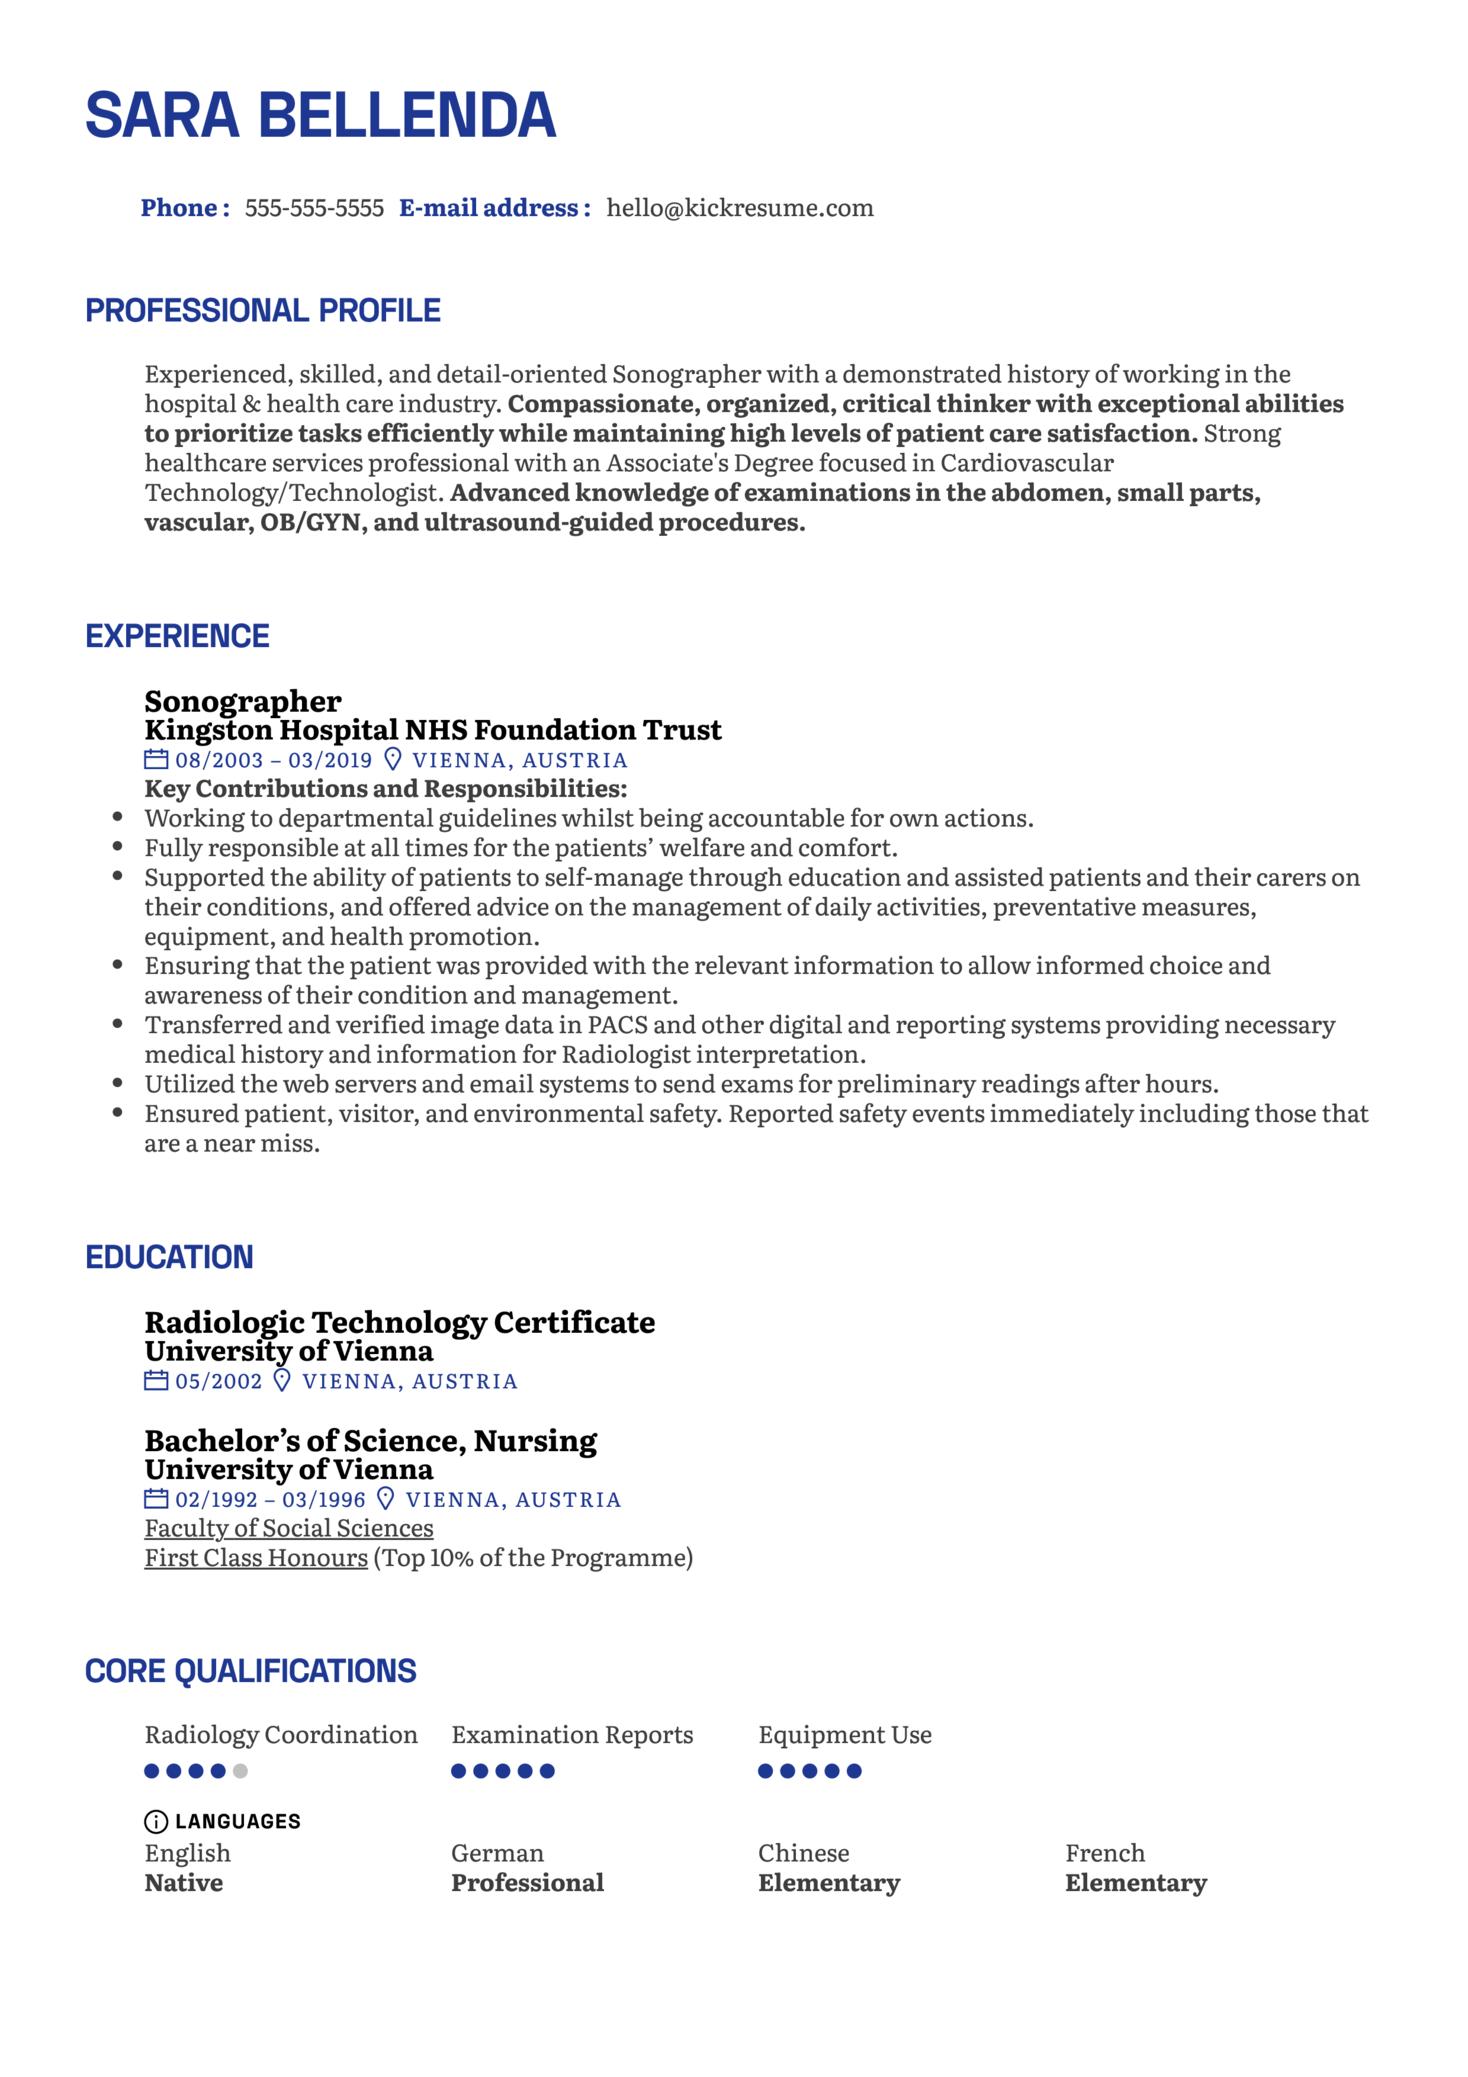 Sonographer Resume Example (Teil 1)